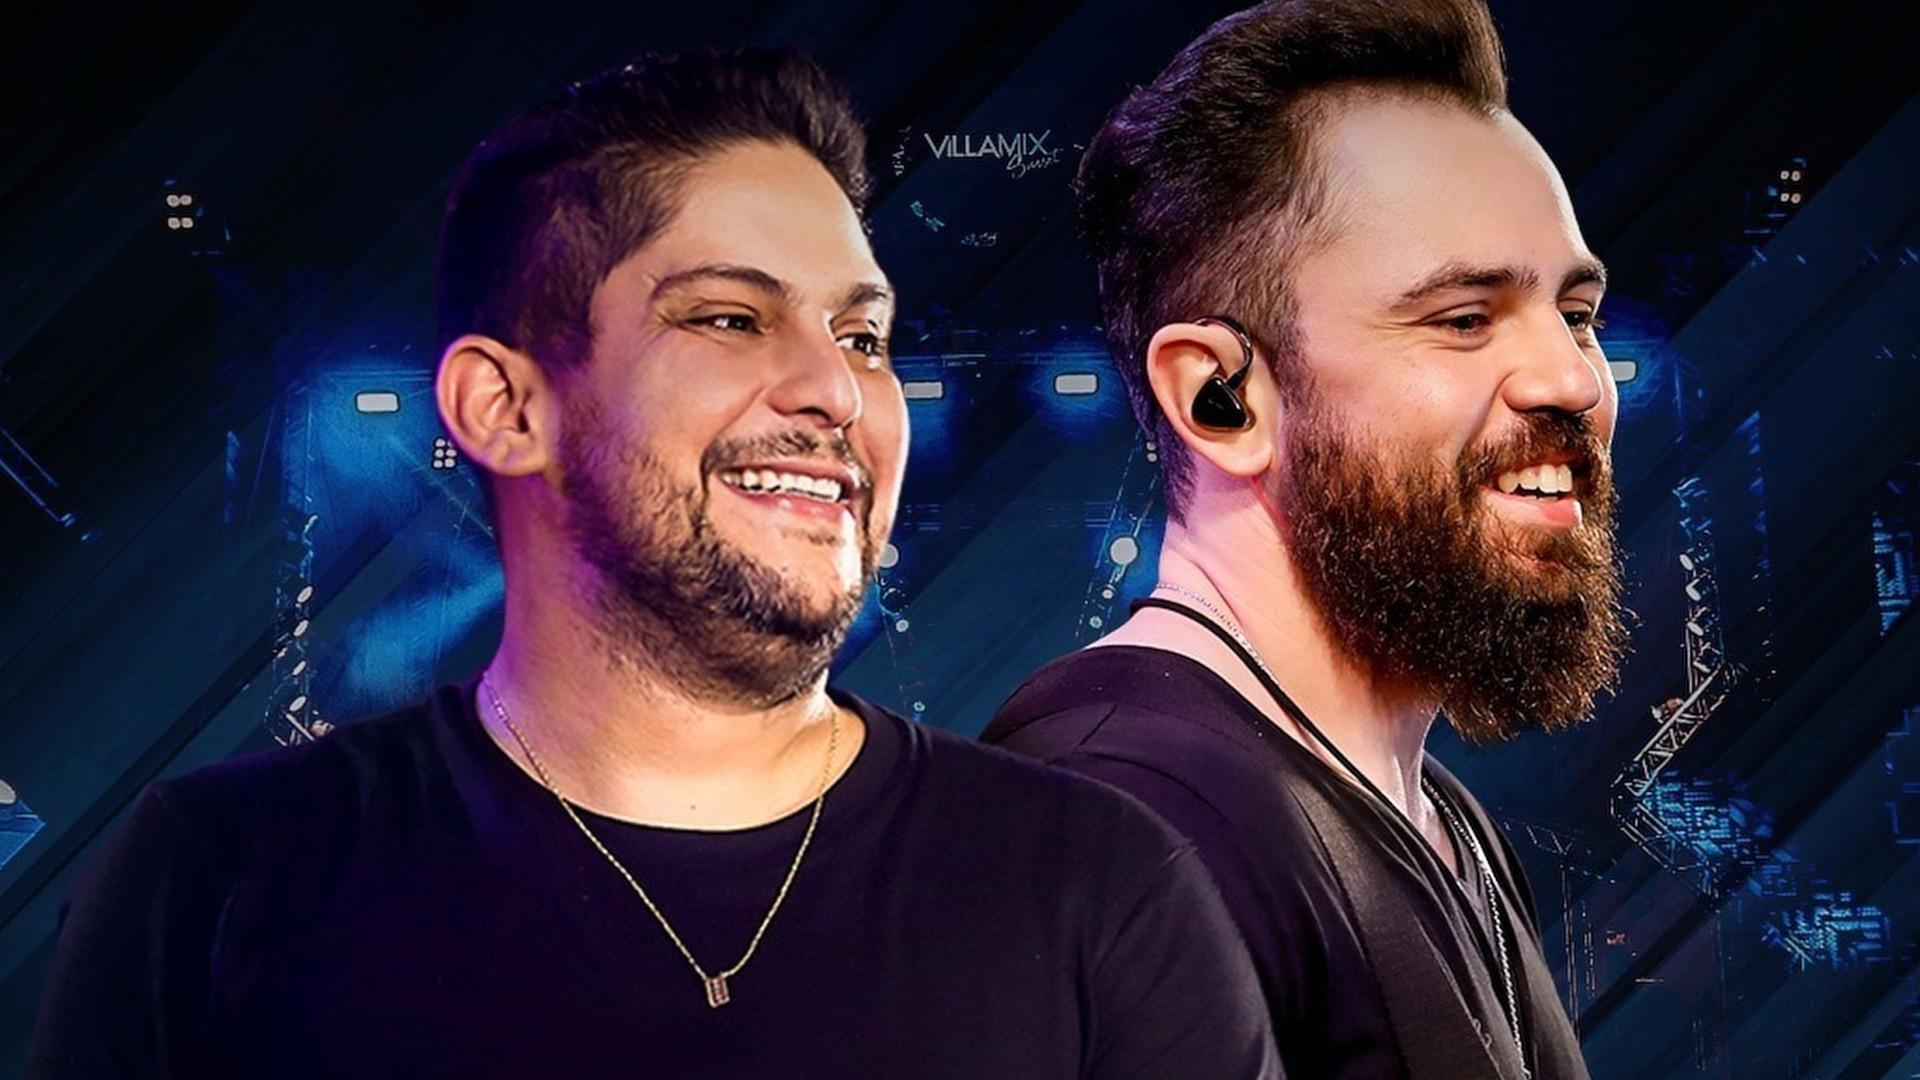 Festival Villa Mix desembarca em Lisboa levando estrelas brasileiras